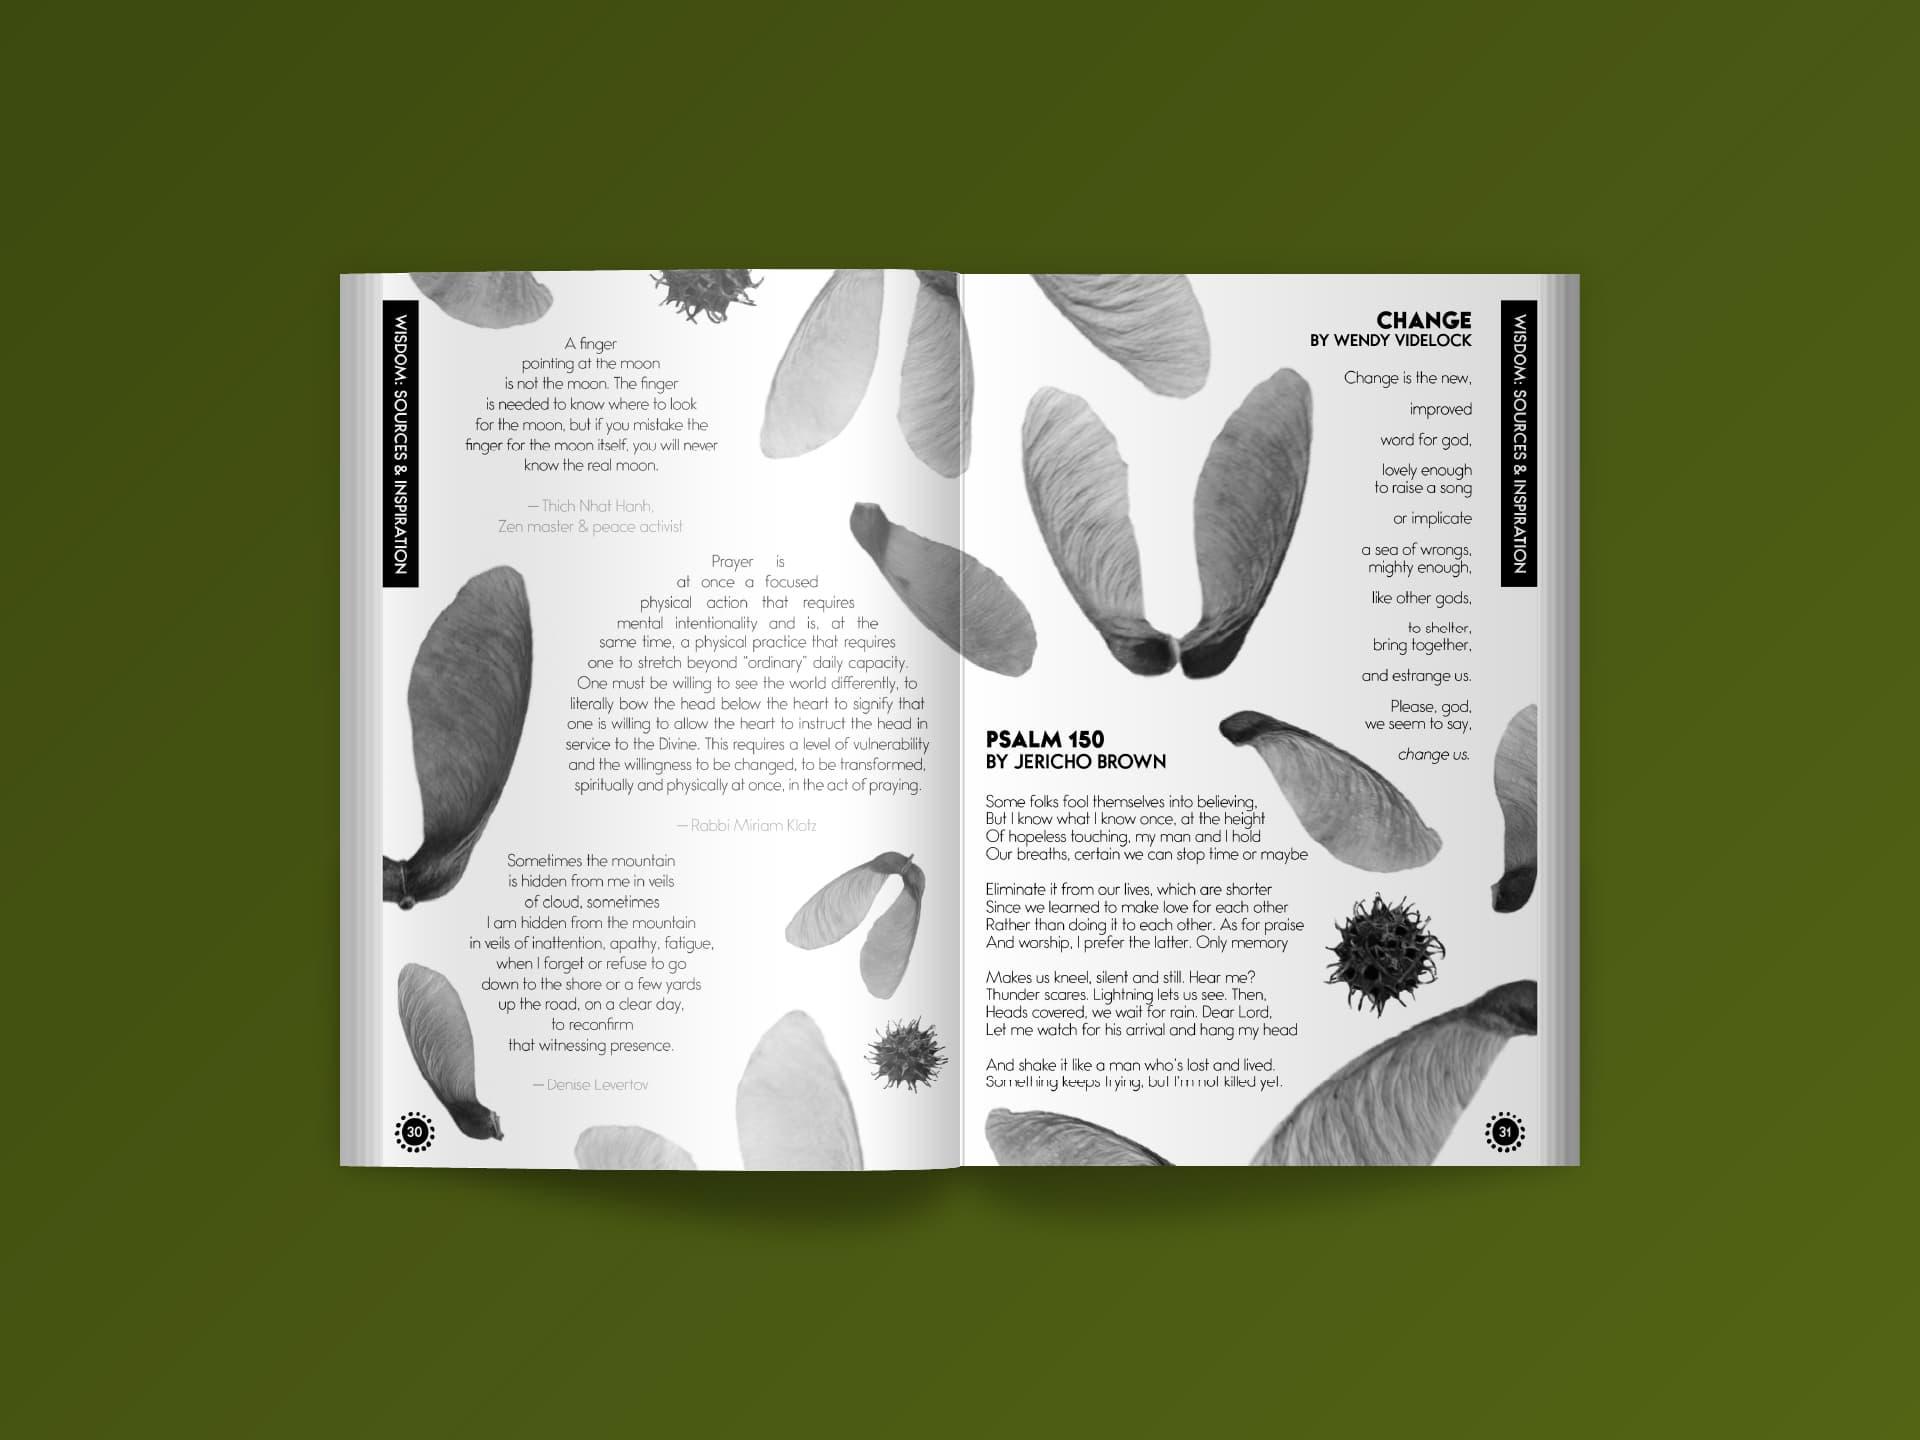 Program (Pages 30-31)